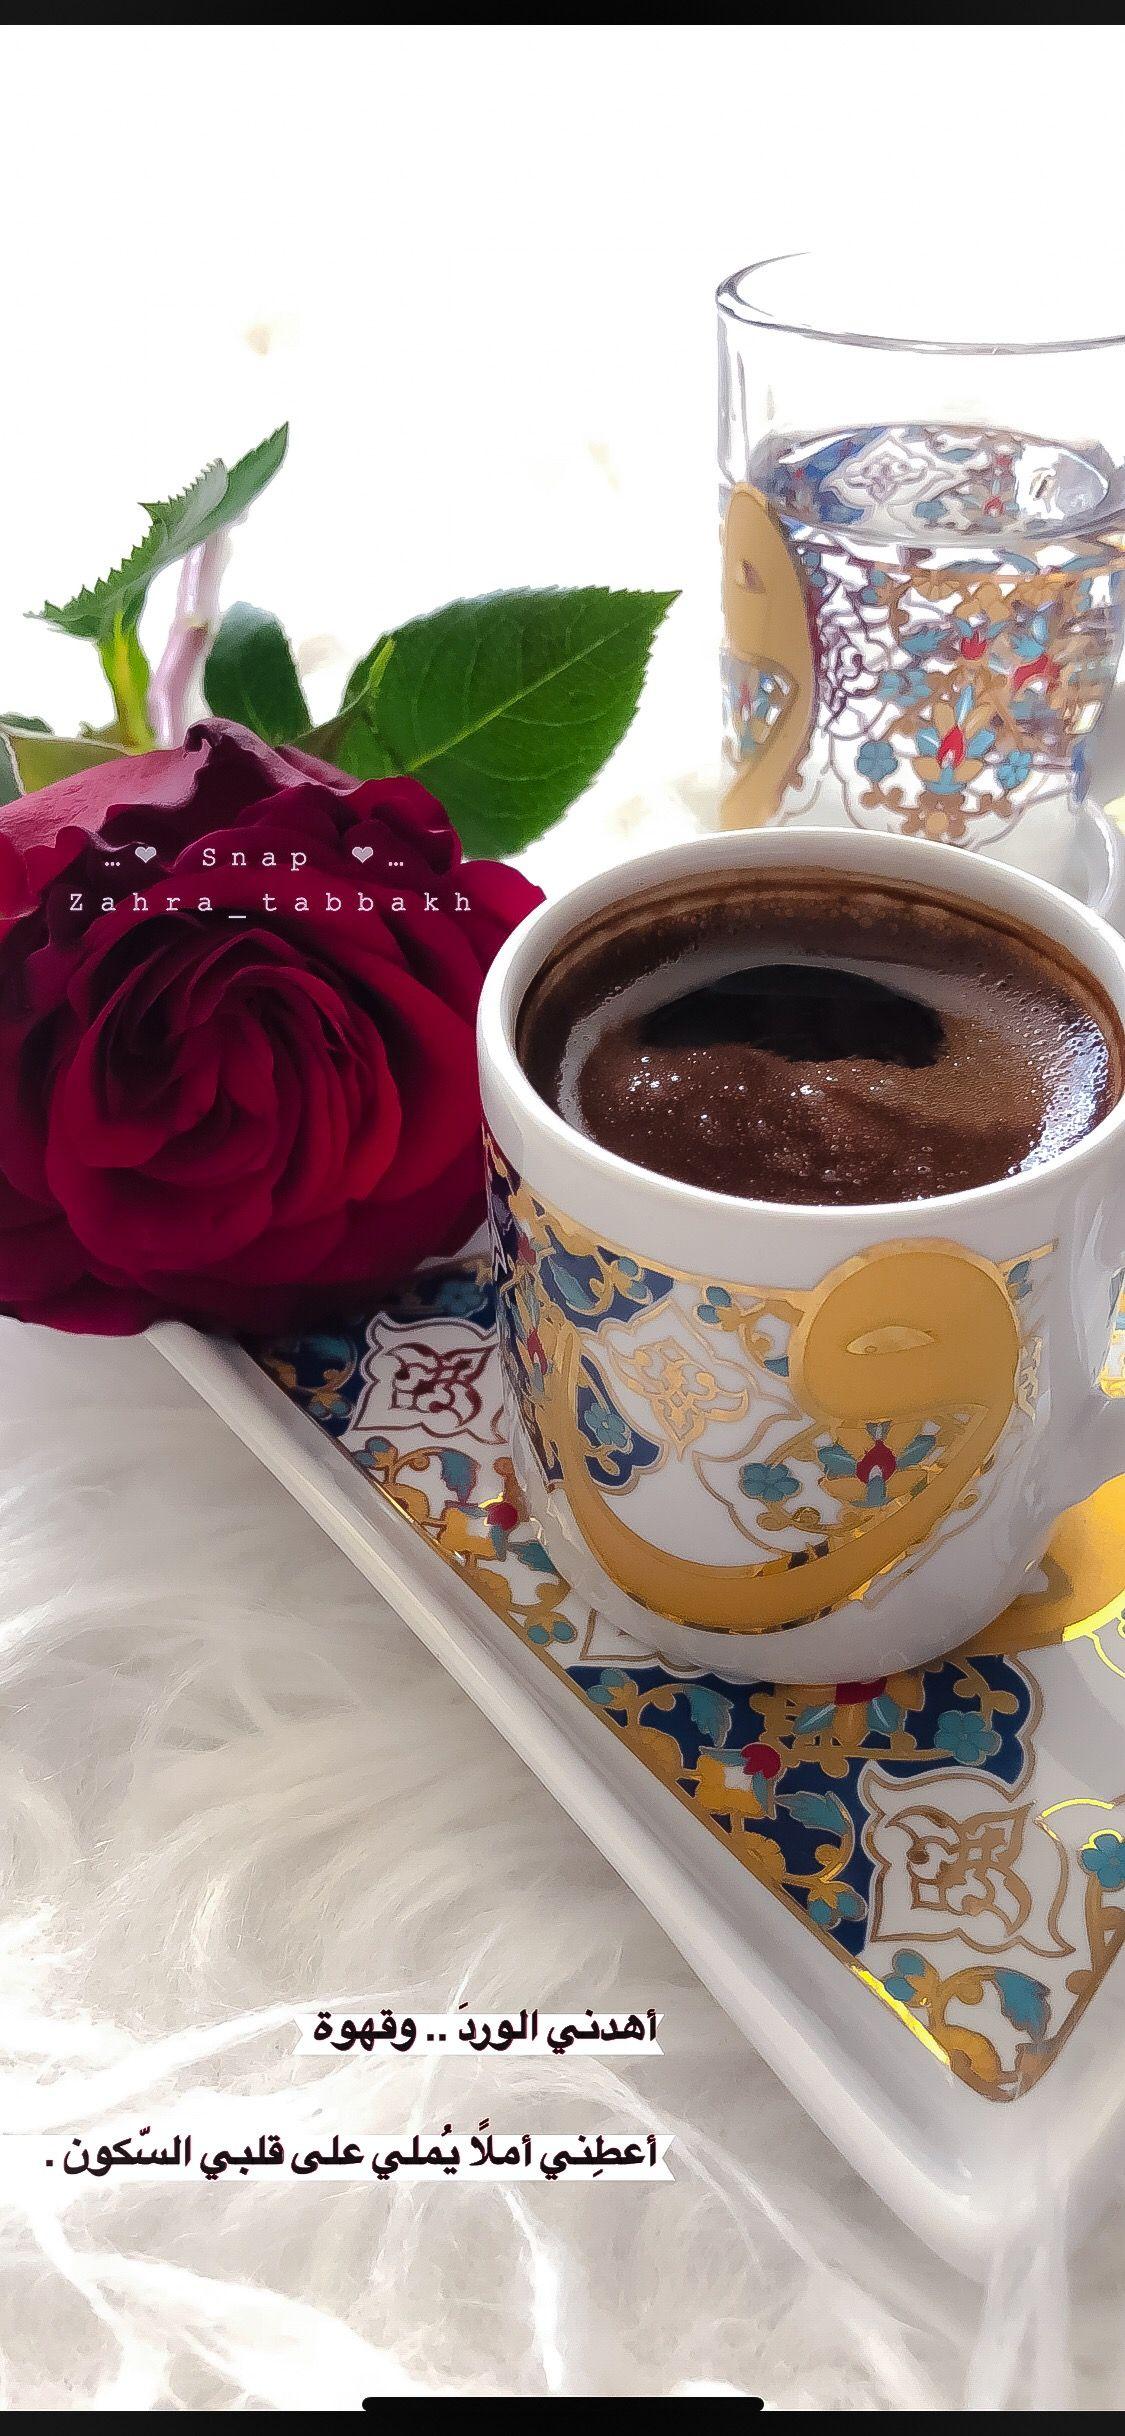 Pin By Tarfah On حكم My Coffee Food Coffee Time